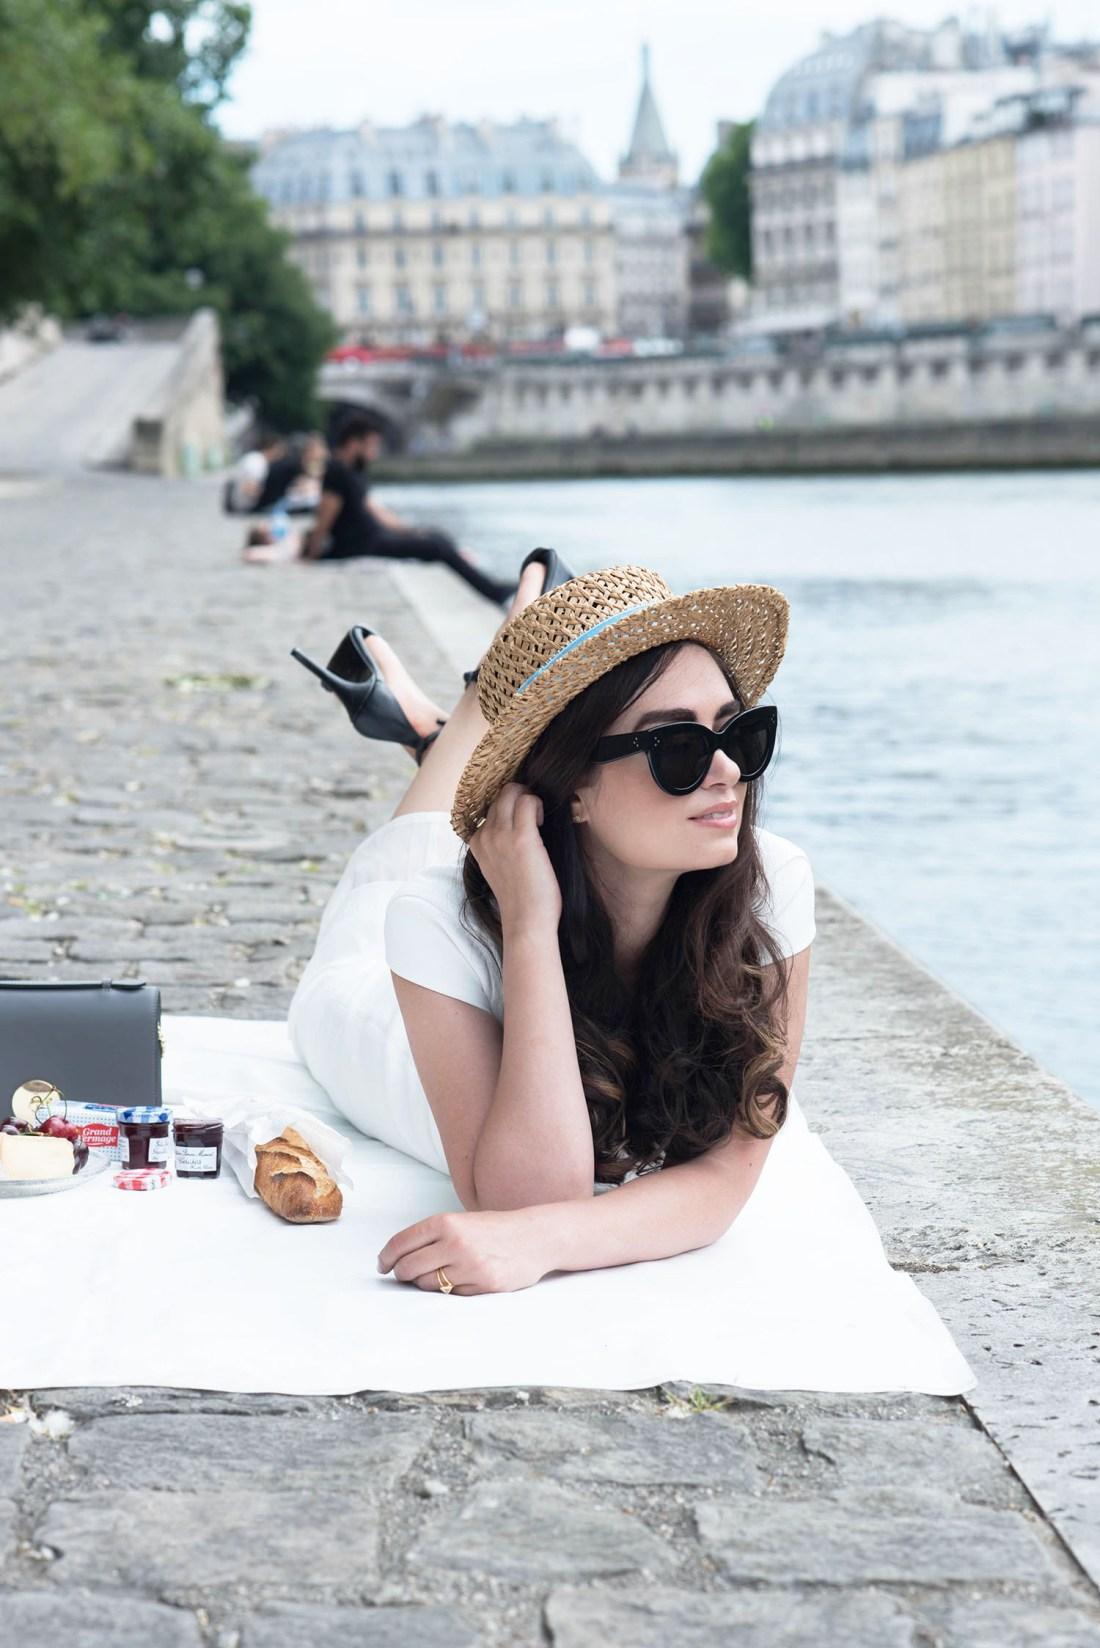 Fashion blogger Cee Fardoe of Coco & Vera celebrates Bastille Day with a picnic on the quais de la Seine wearing an Ivy & Oak dress